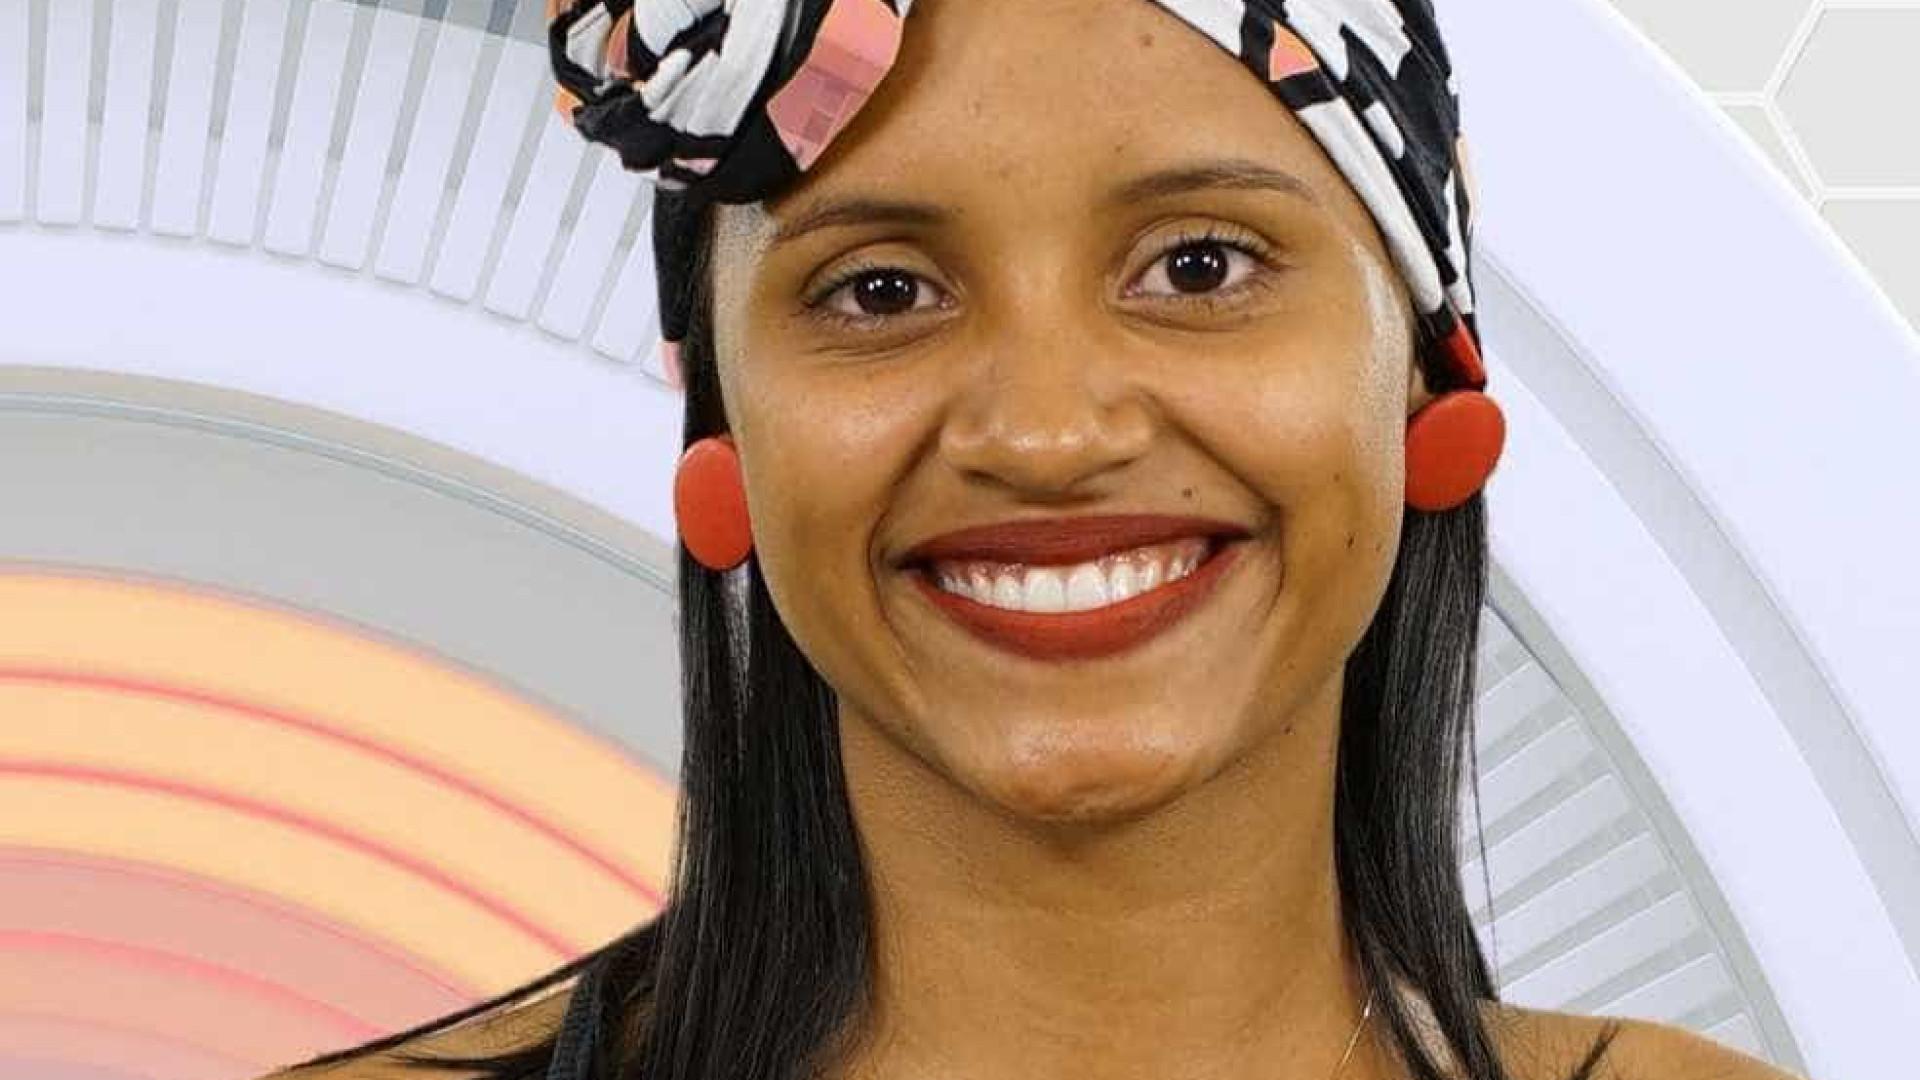 Gleici, participante do 'BBB 18', é exonerada de cargo público no Acre